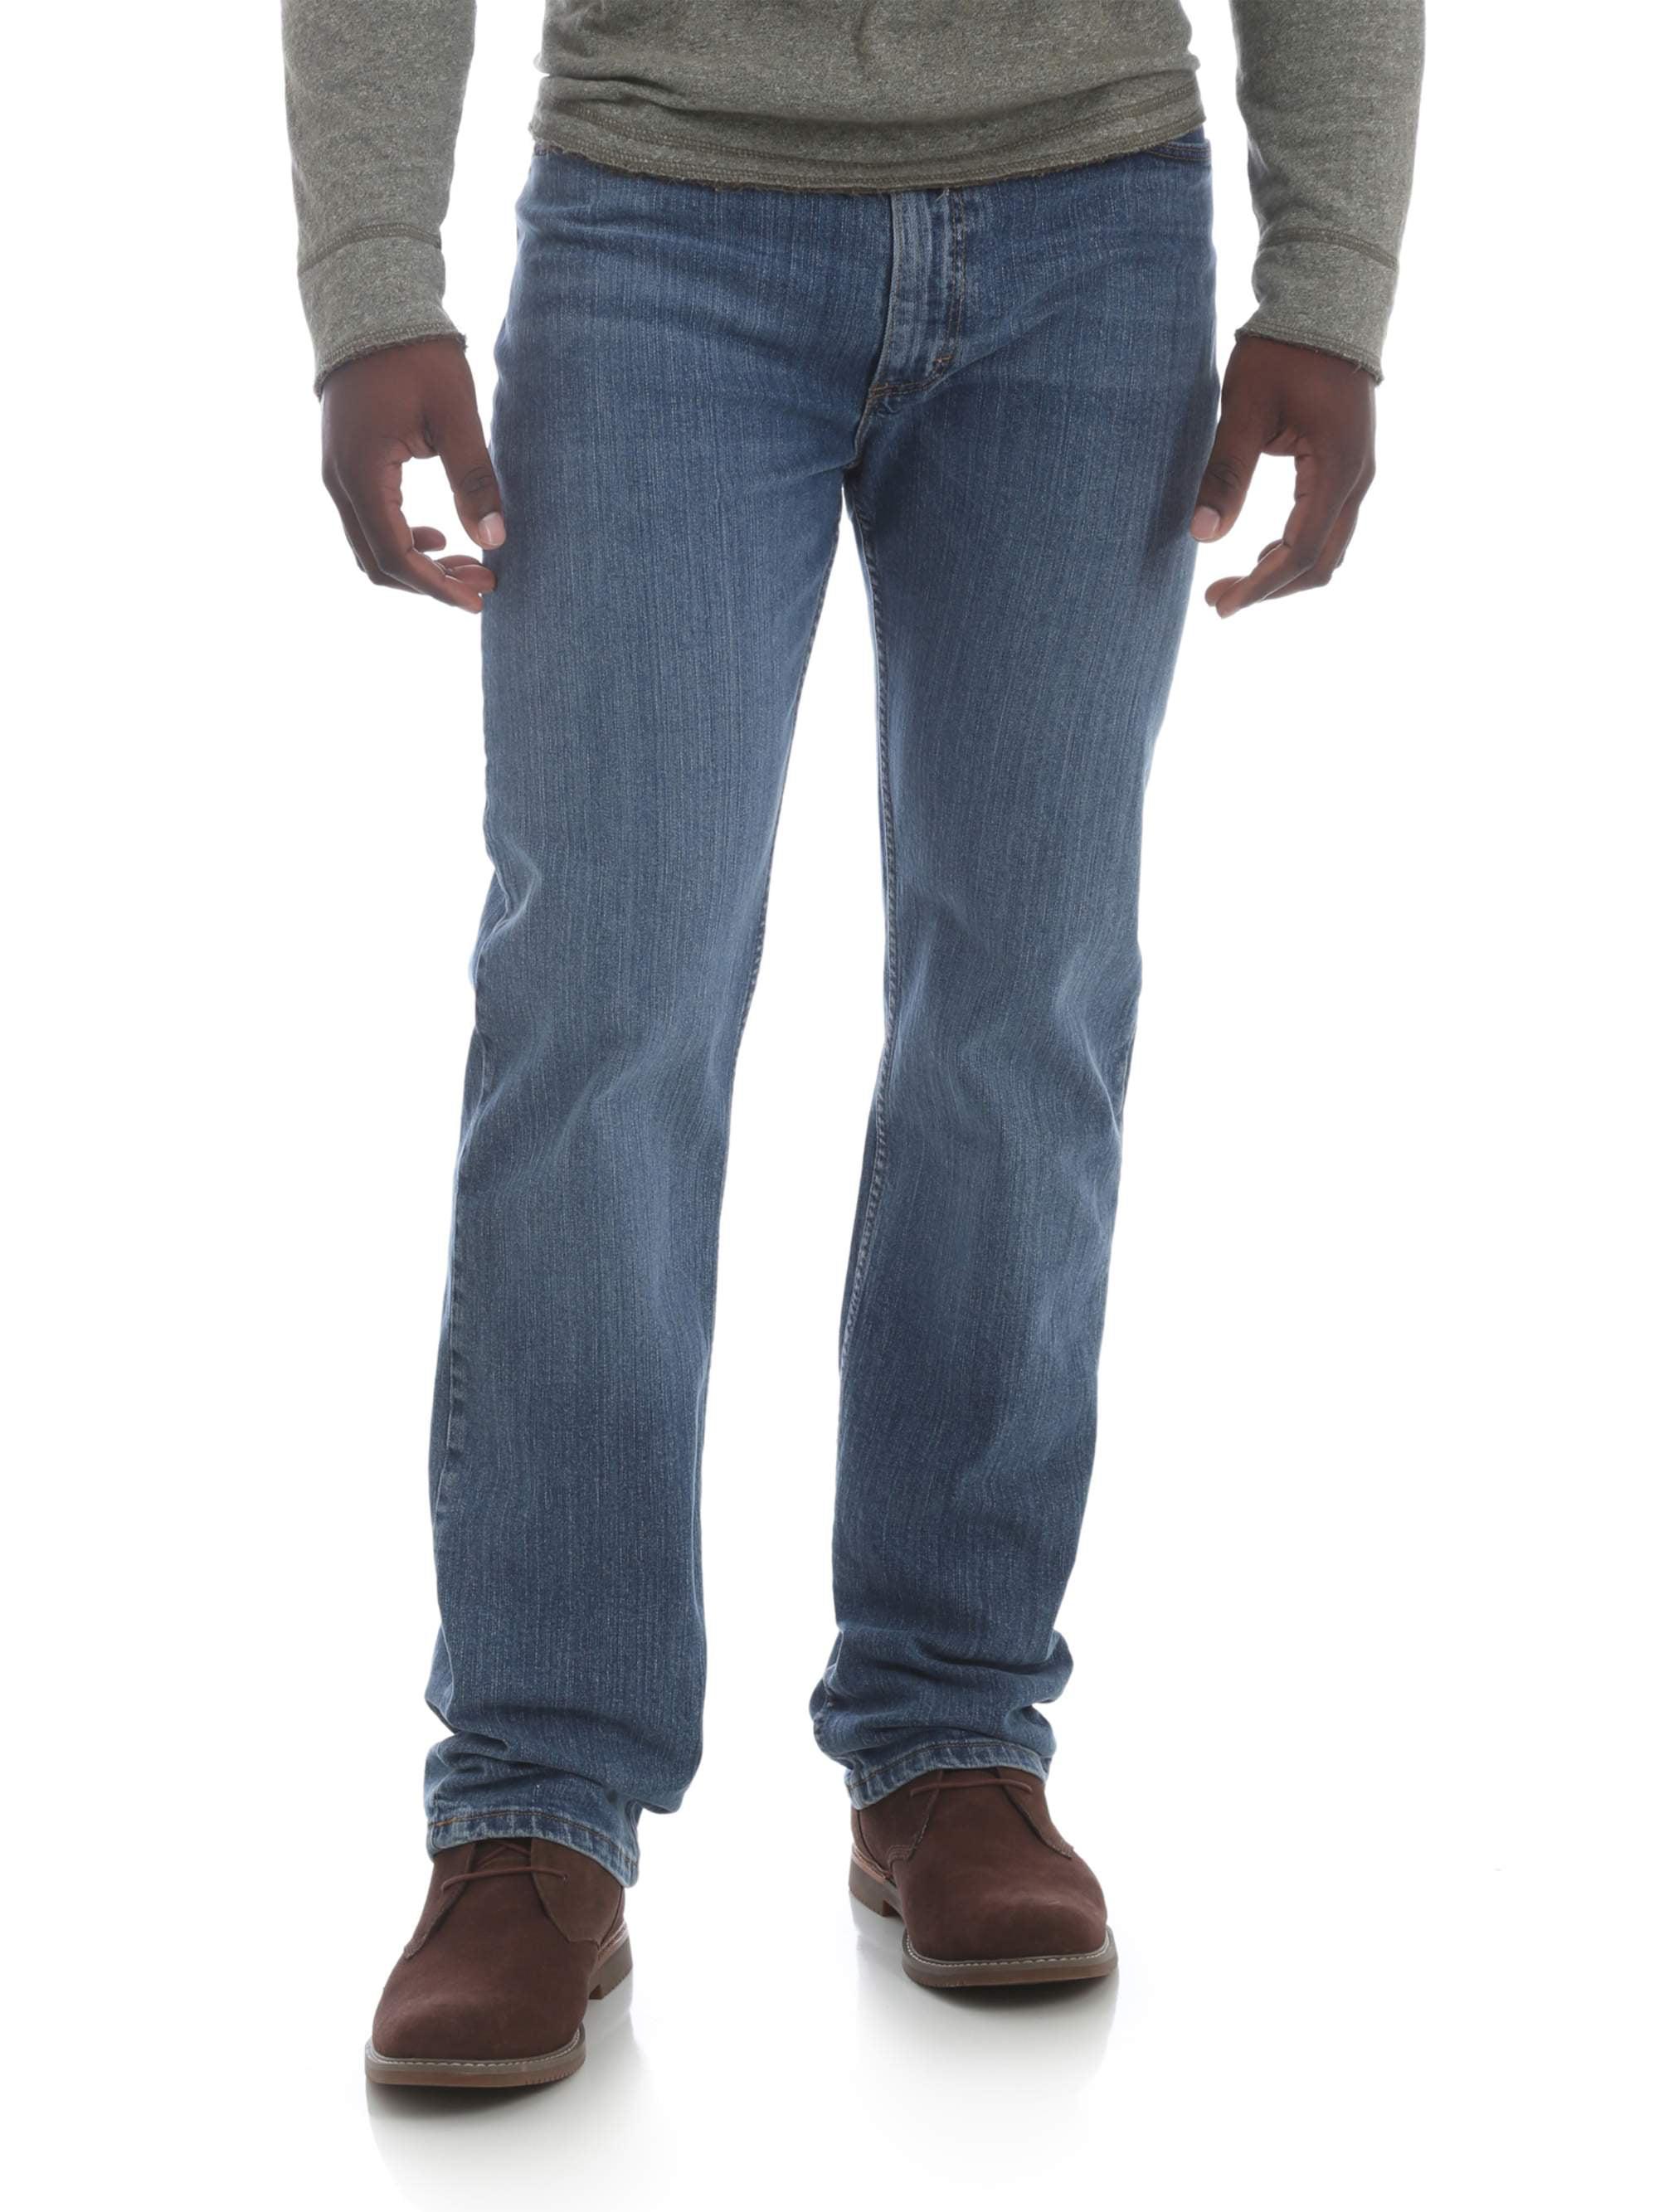 ef2e5808 Wrangler - Wrangler Men's 5 Star Regular Fit Jean with Flex - Walmart.com